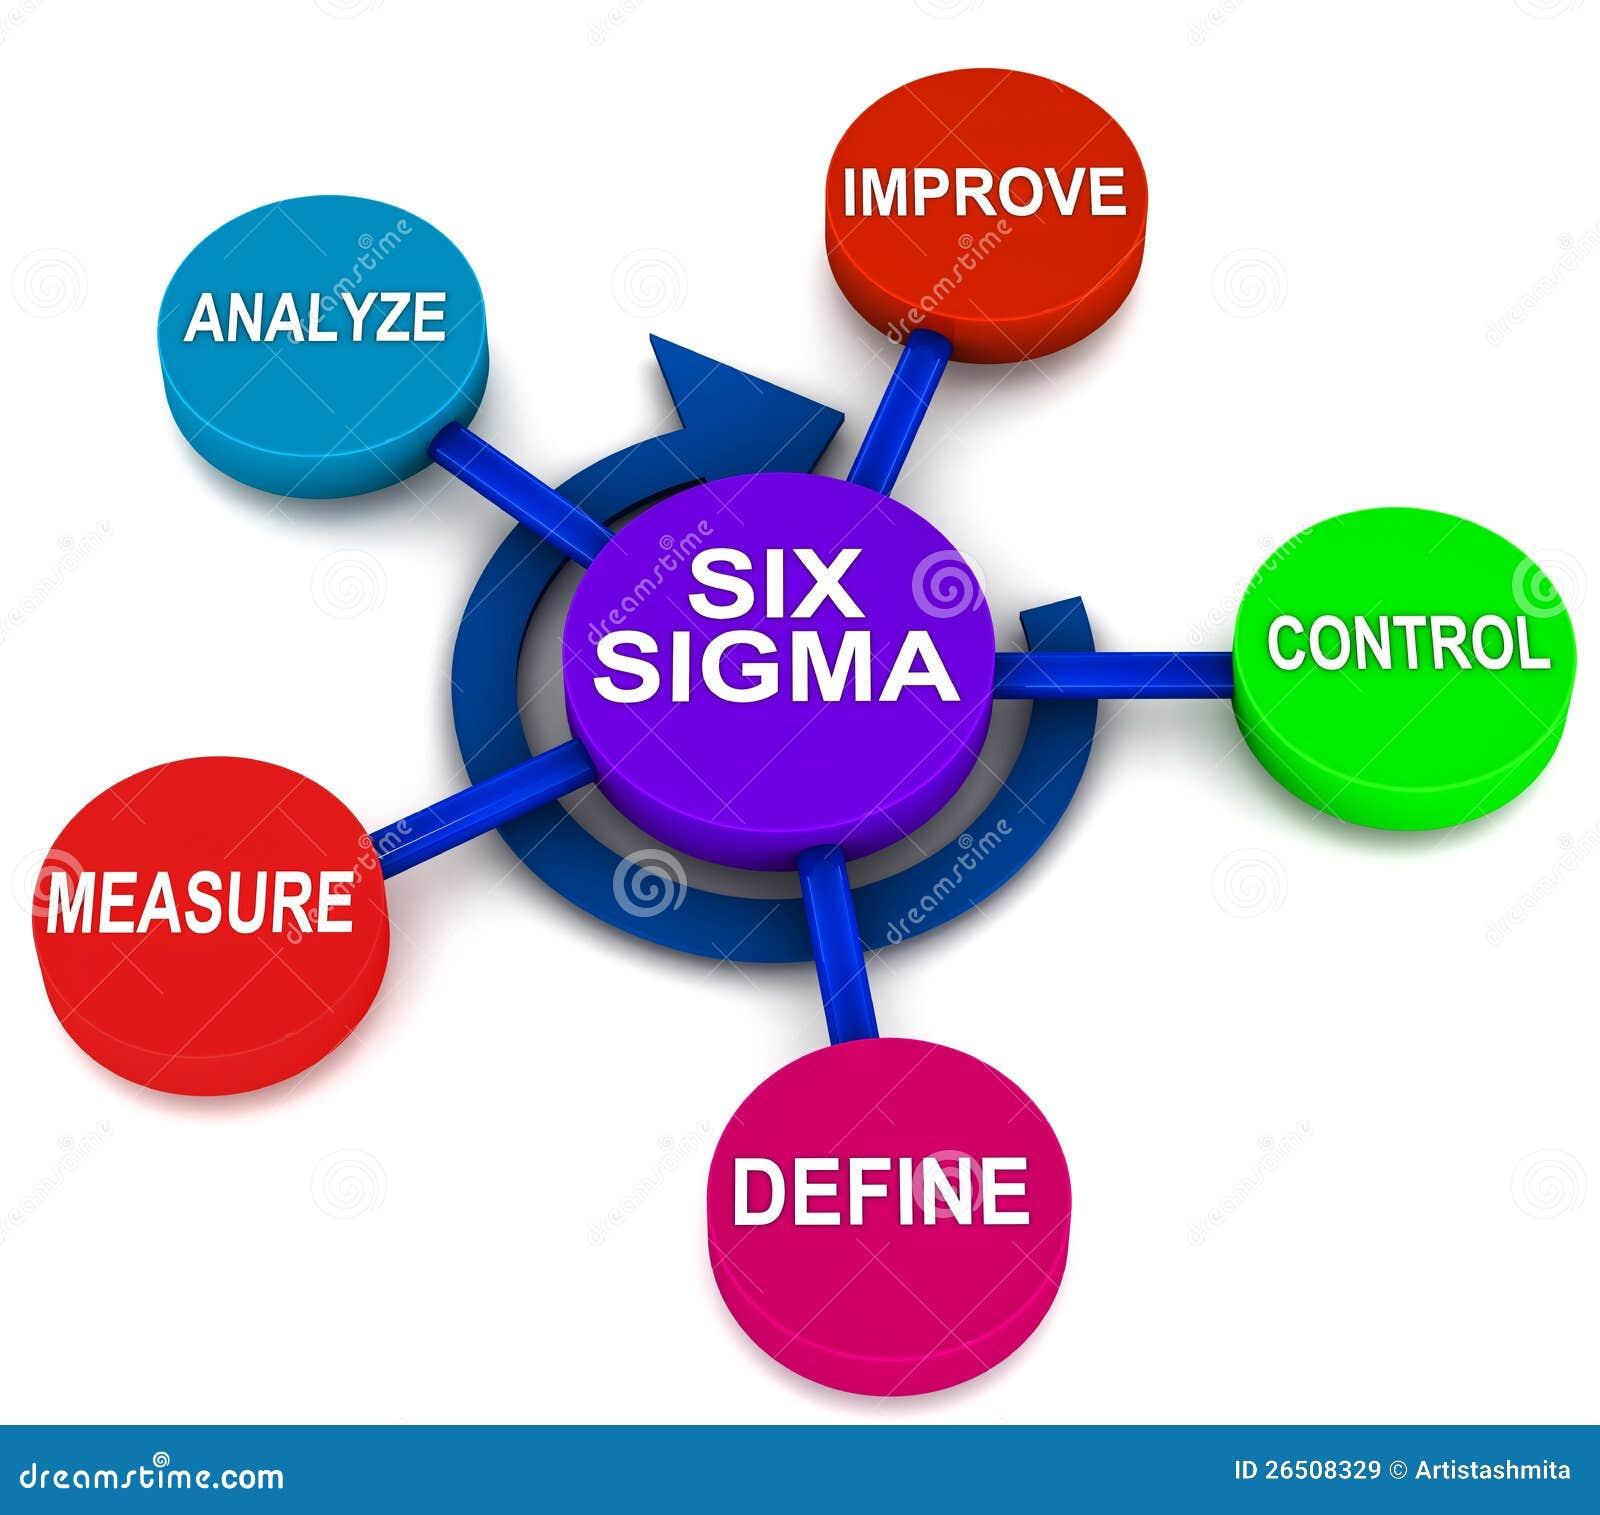 Six sigma dmaic stock illustration illustration of define 26508329 six sigma dmaic xflitez Image collections